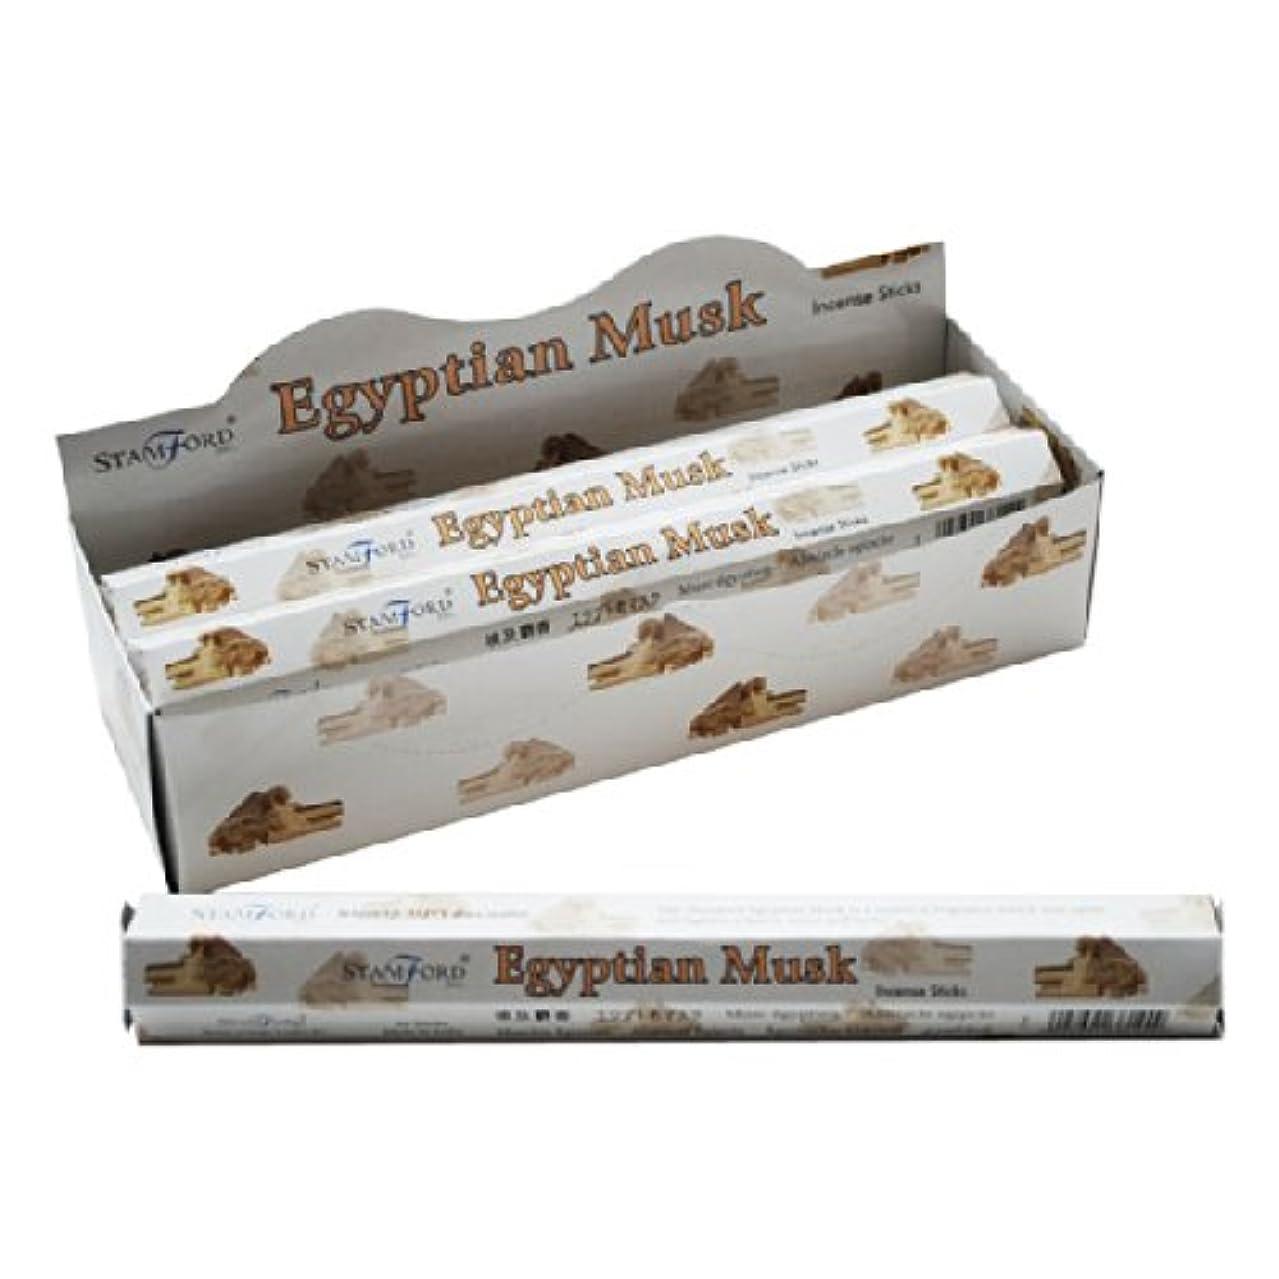 6 Packs Of Elements Egyptian Musk Incense Sticks